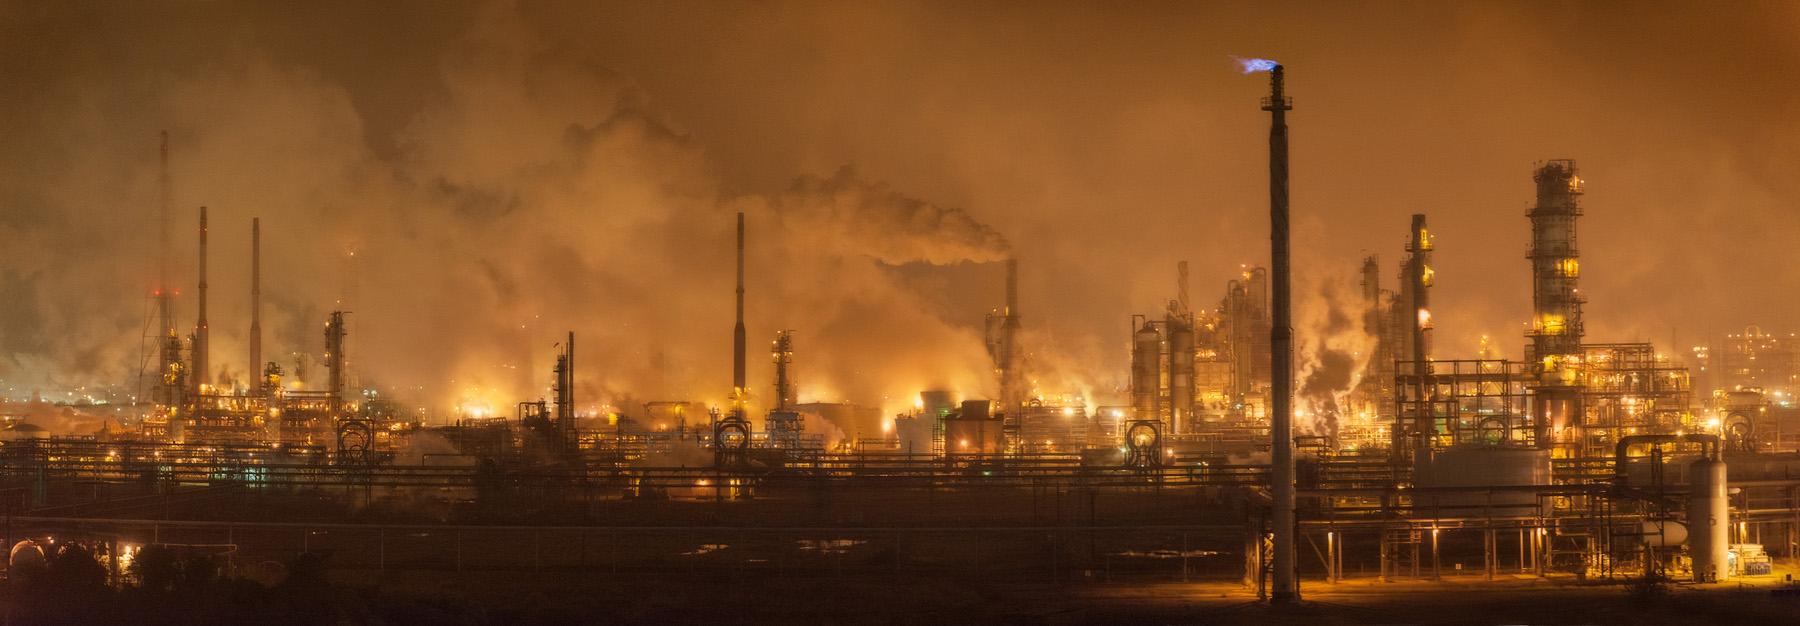 Chemical plants on the Houston Ship Channel. Photo: Louis Vest via Flickr